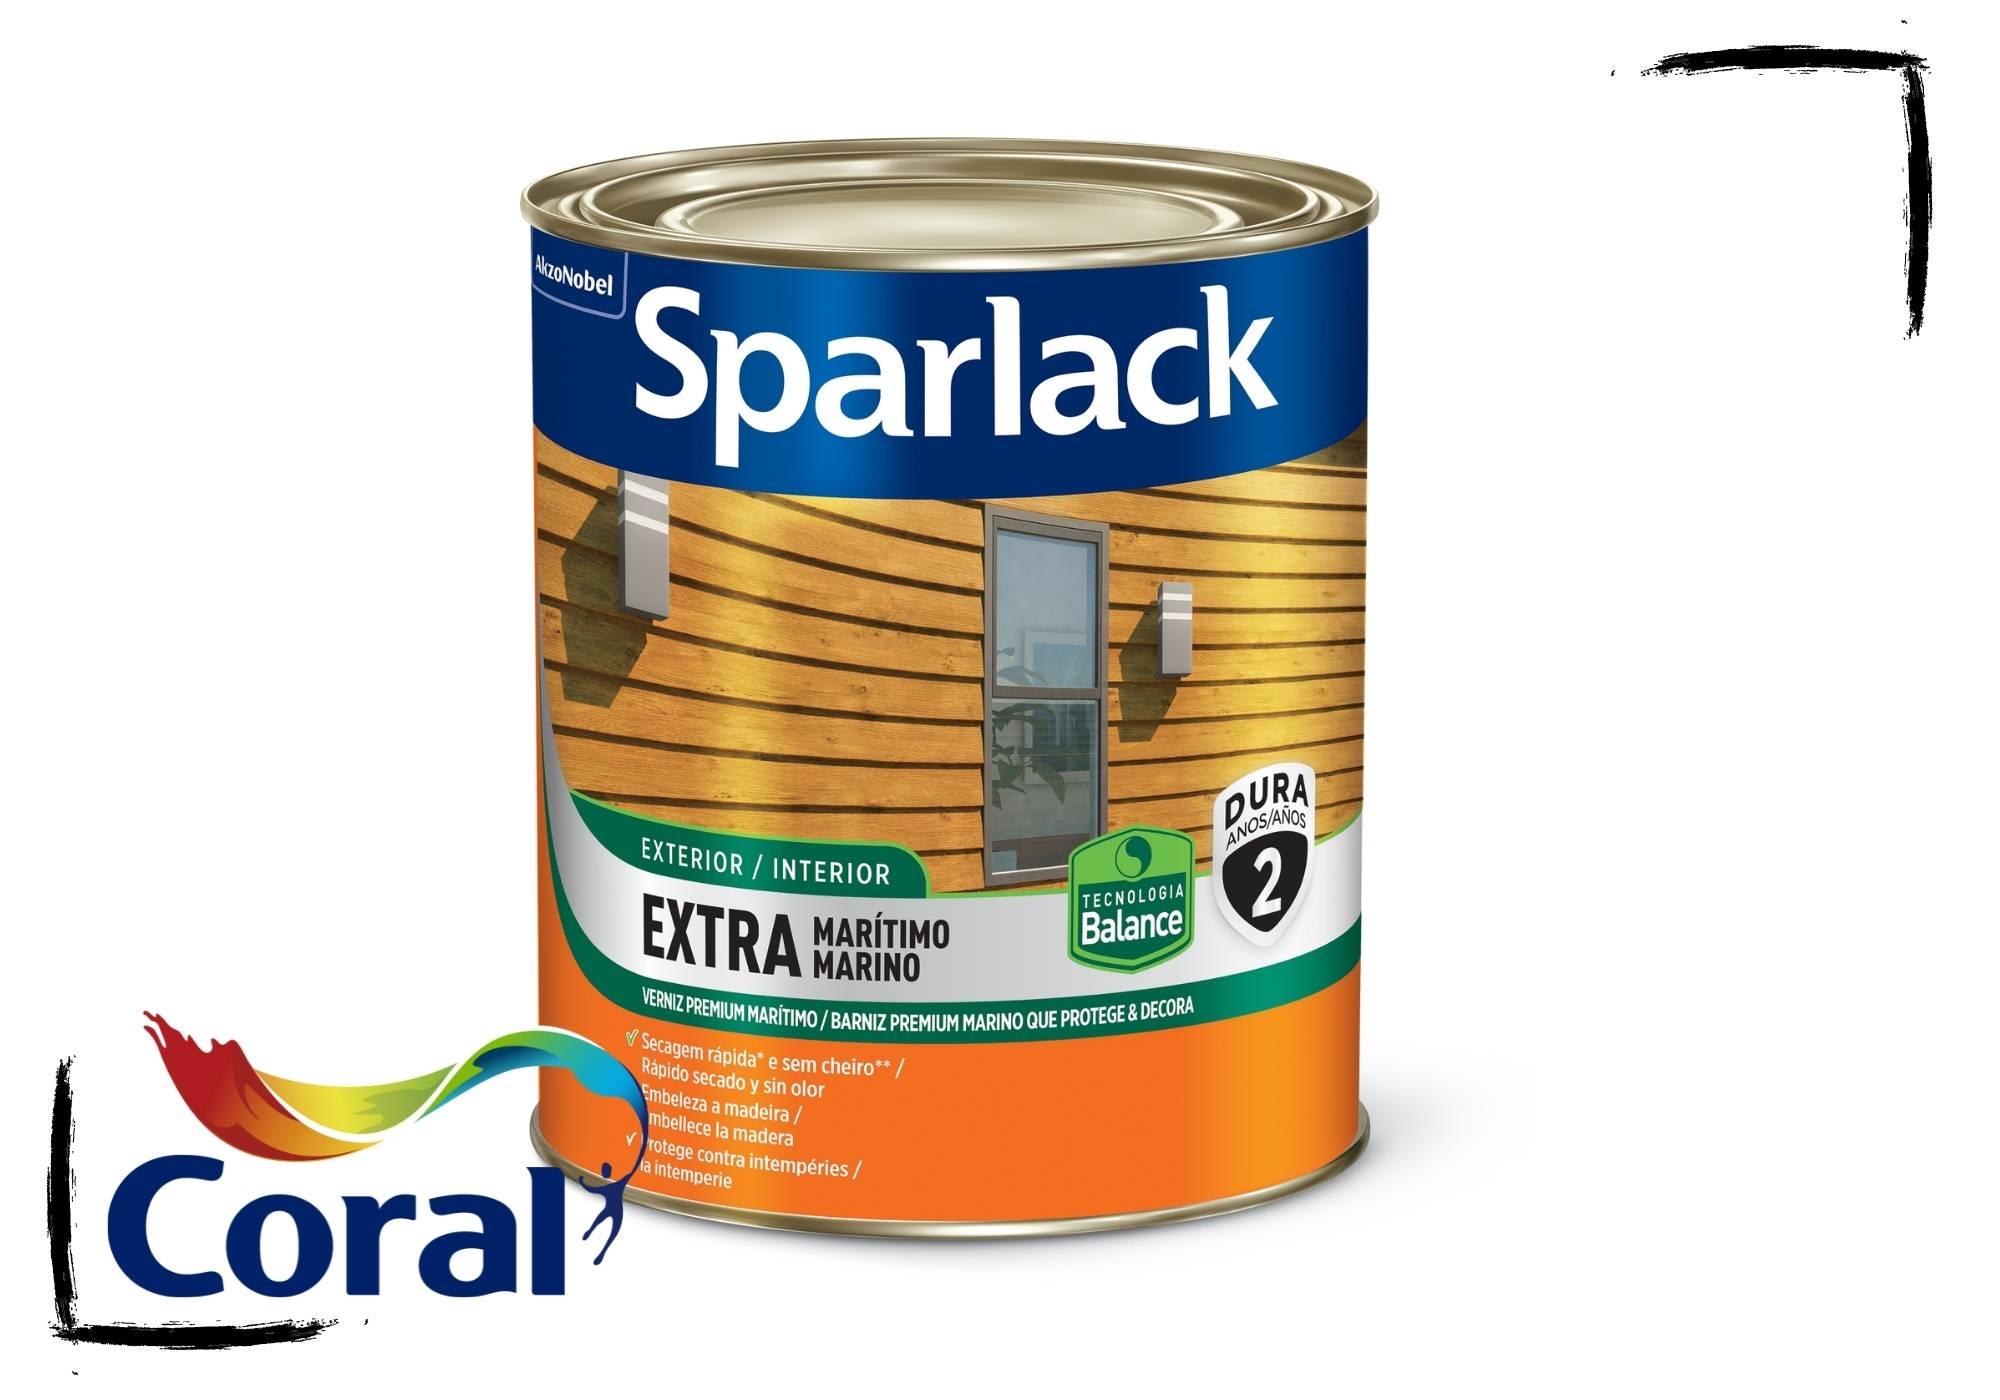 Sparlack Verniz Extra Marítimo Natural e Cores Acetinado Balance 900ml